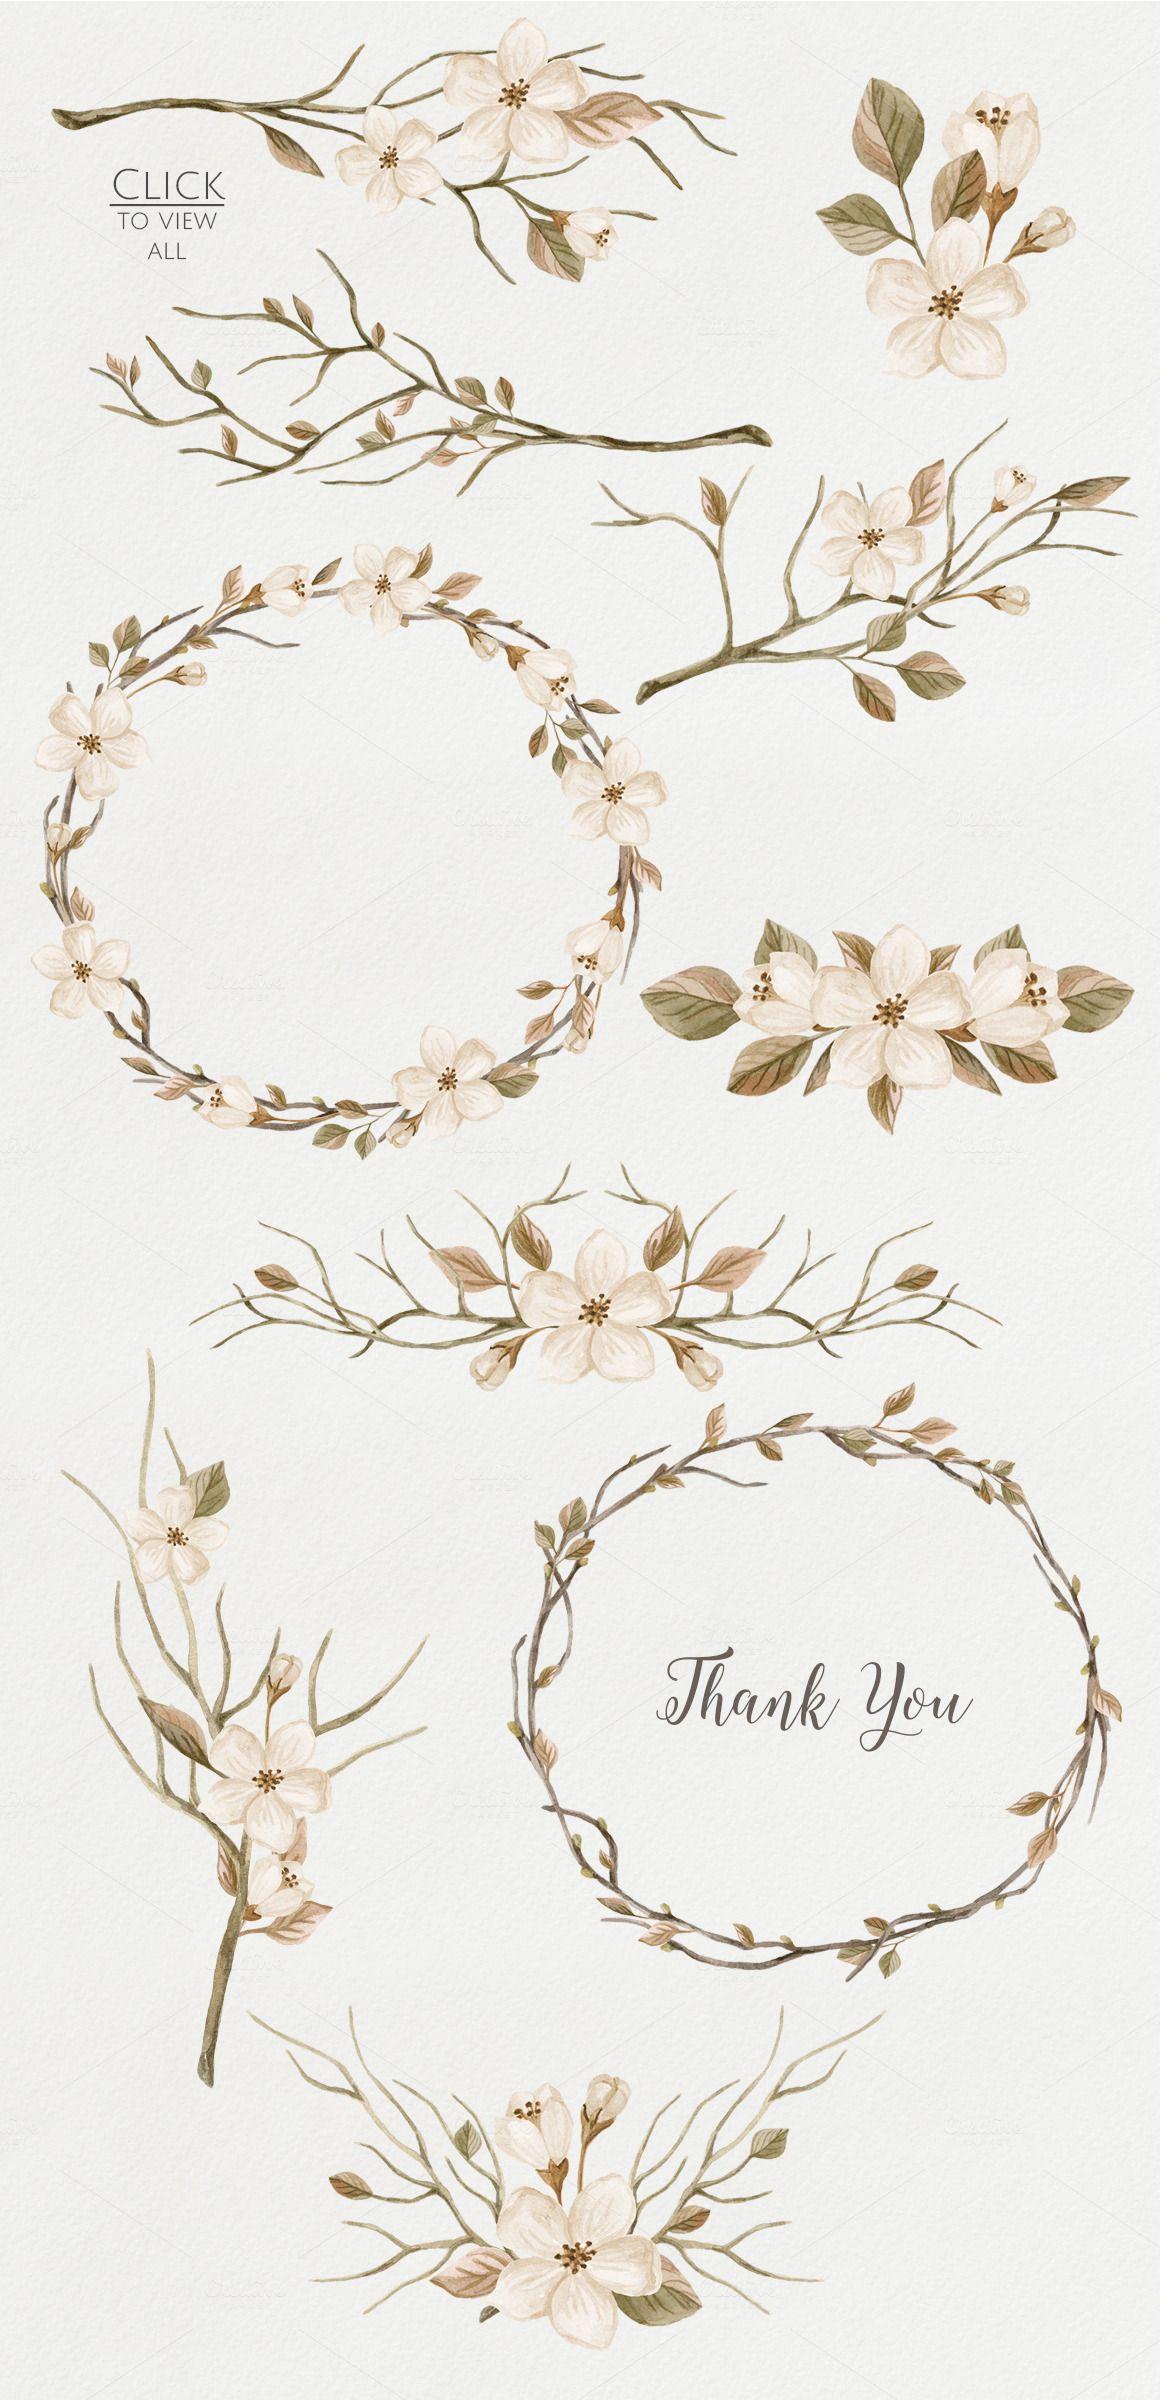 WatercolorRetroSet.FloweringBranches by NataliVA on Creative Market